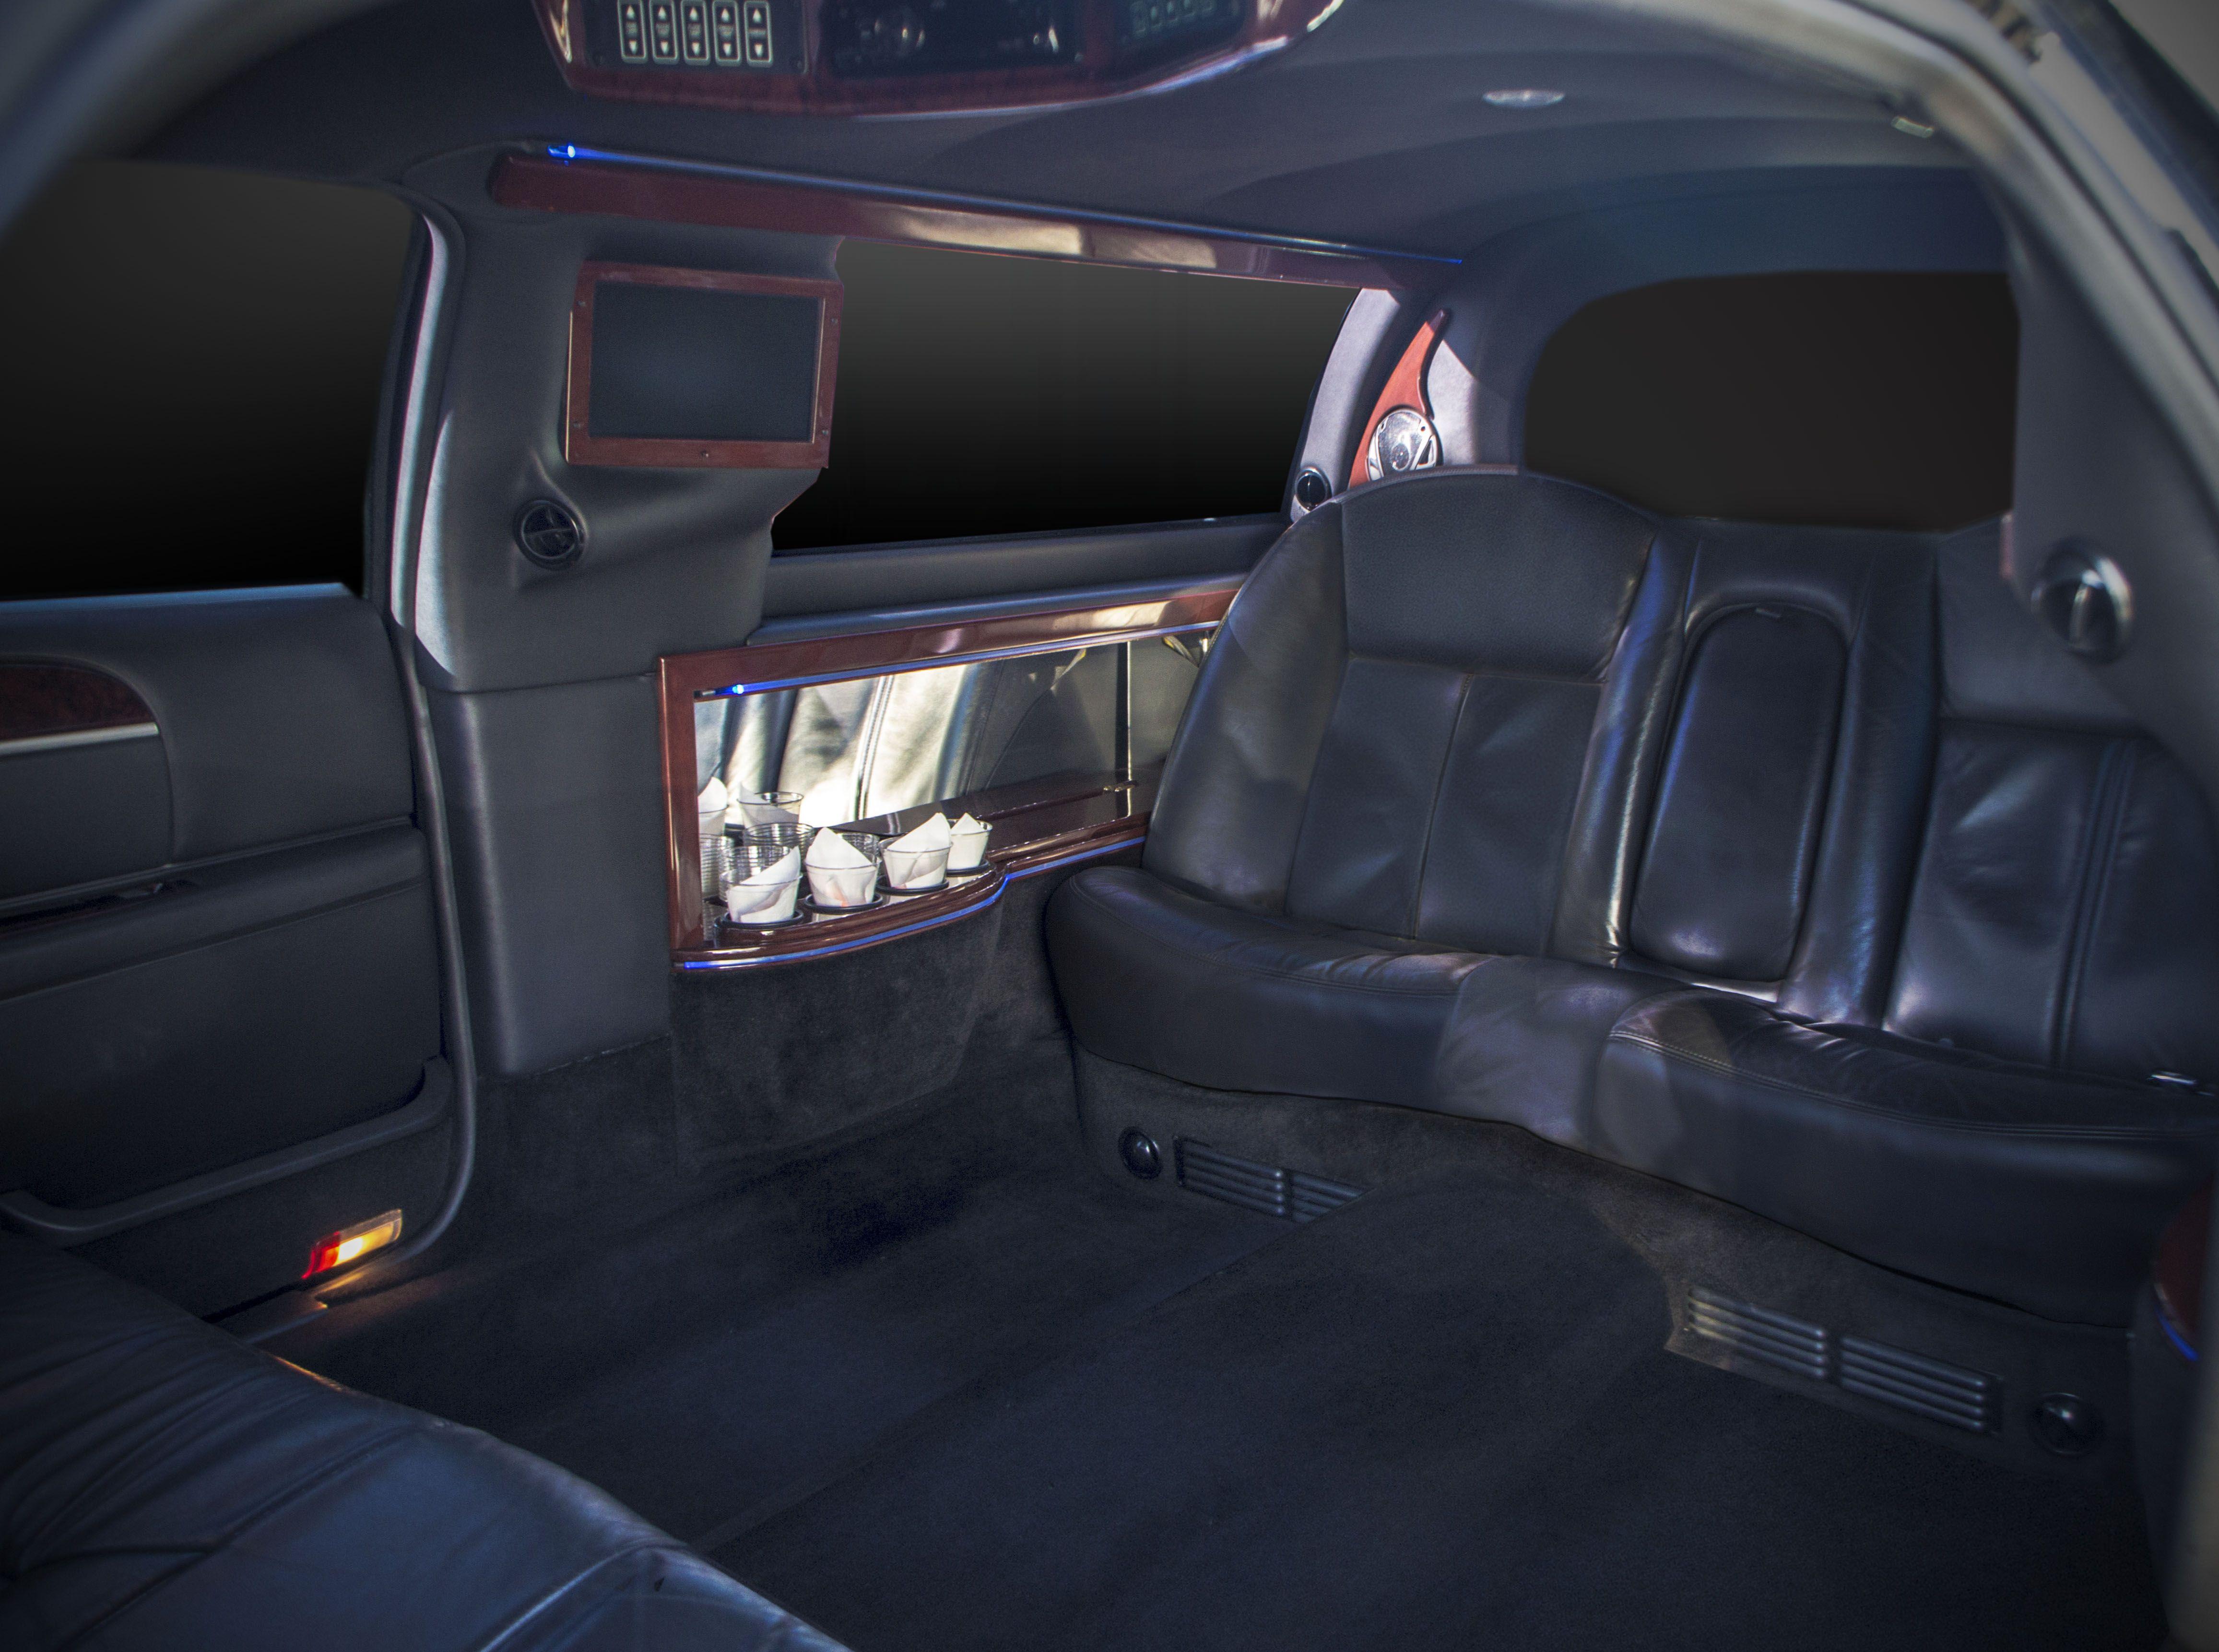 Car interior entertainment - Stretch Limousine Seats 6 Passengers Black Exterior Interior Two Tvs Entertainment Center